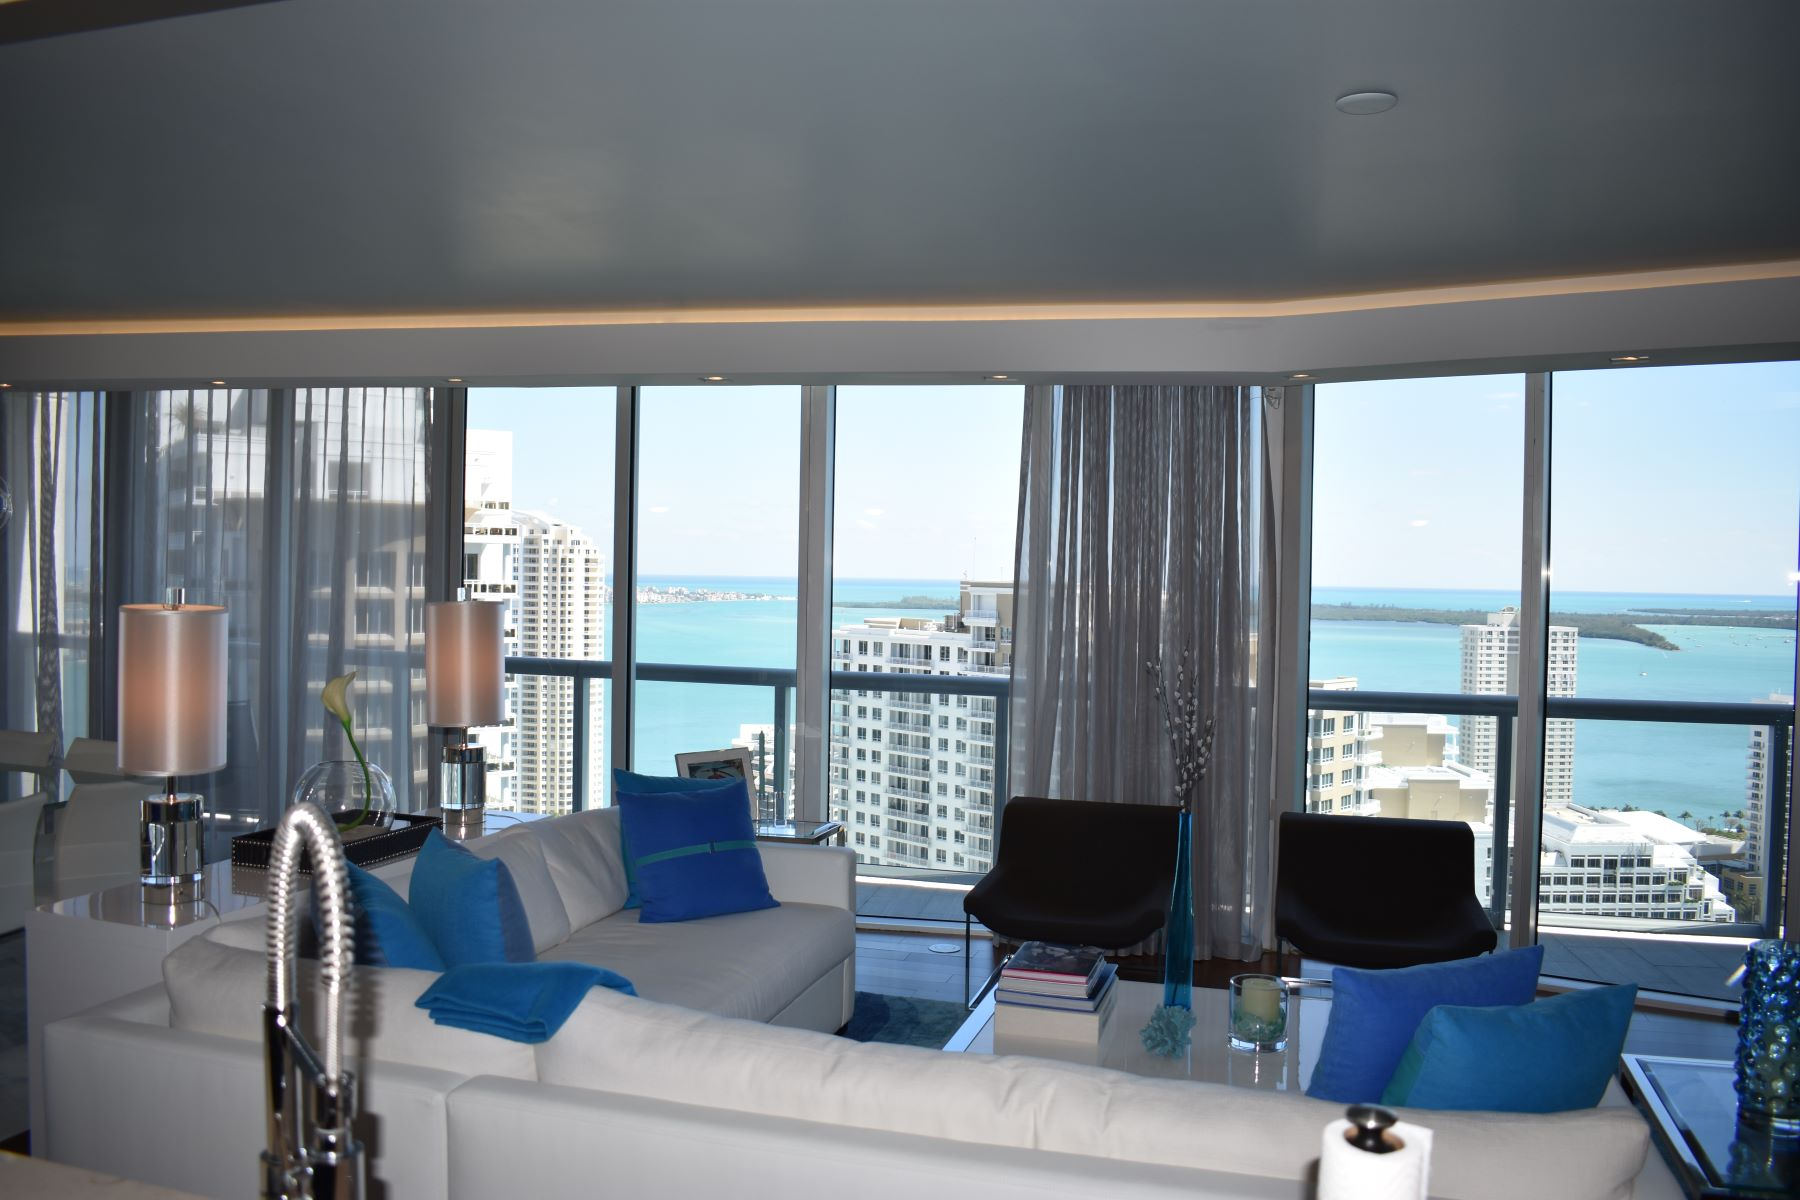 Condominium for Sale at 465 Brickell Ave #3401 465 Brickell Ave 3401, Miami, Florida, 33131 United States